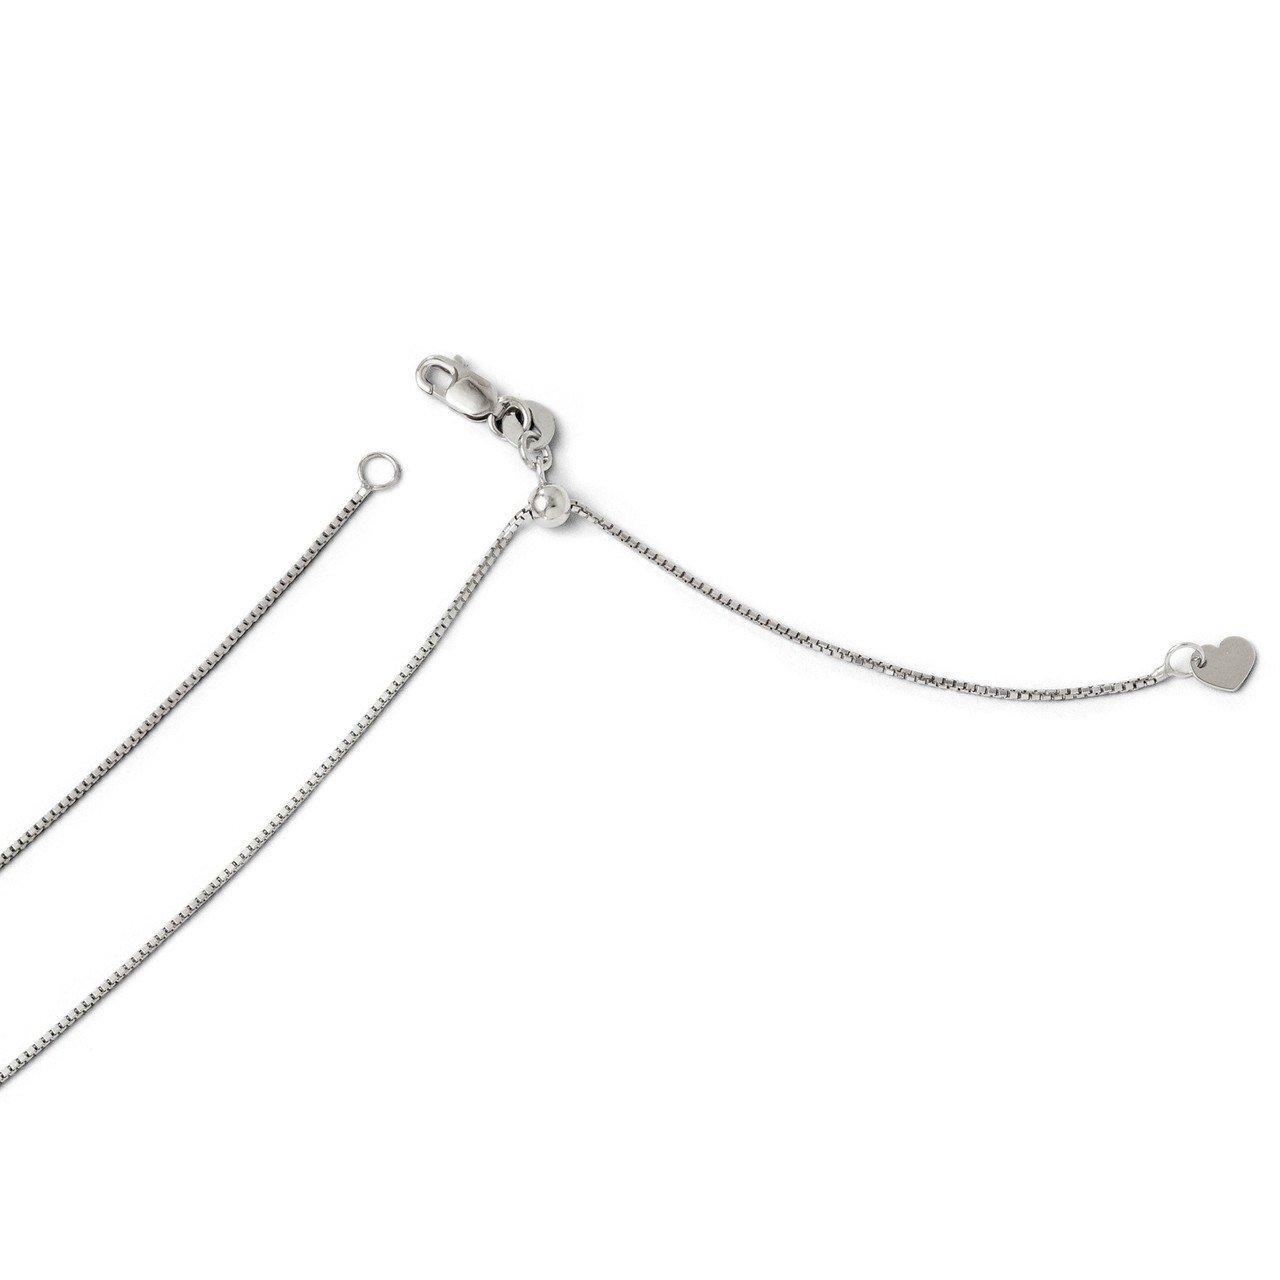 Lex & Lu Leslie's 14k White Gold Adjustable Box Chain Necklace LAL92098-Prime